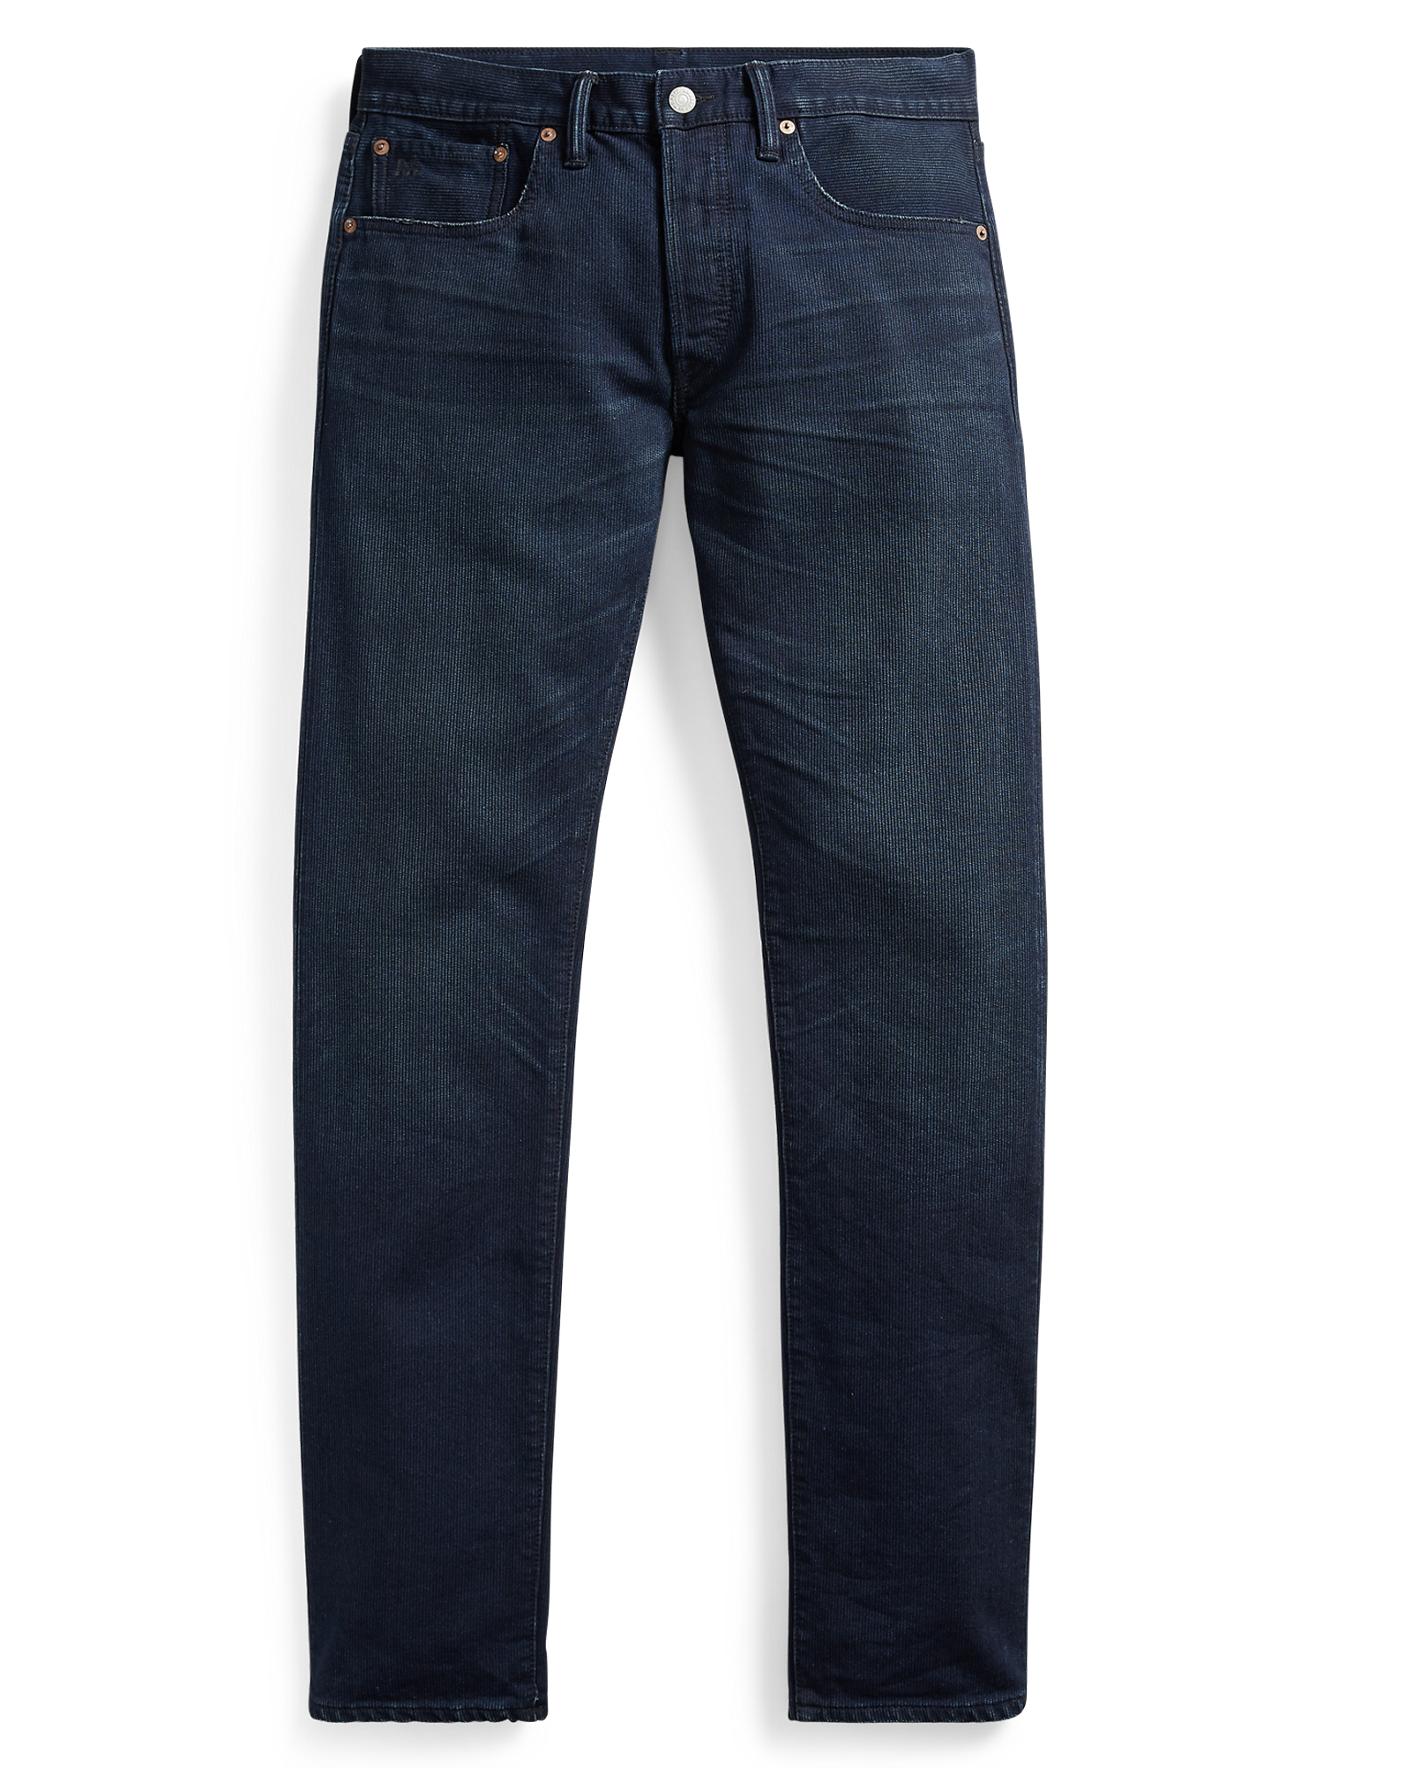 Men's Pants & Jeans - Chino, Khaki, & Corduroy | Ralph Lauren